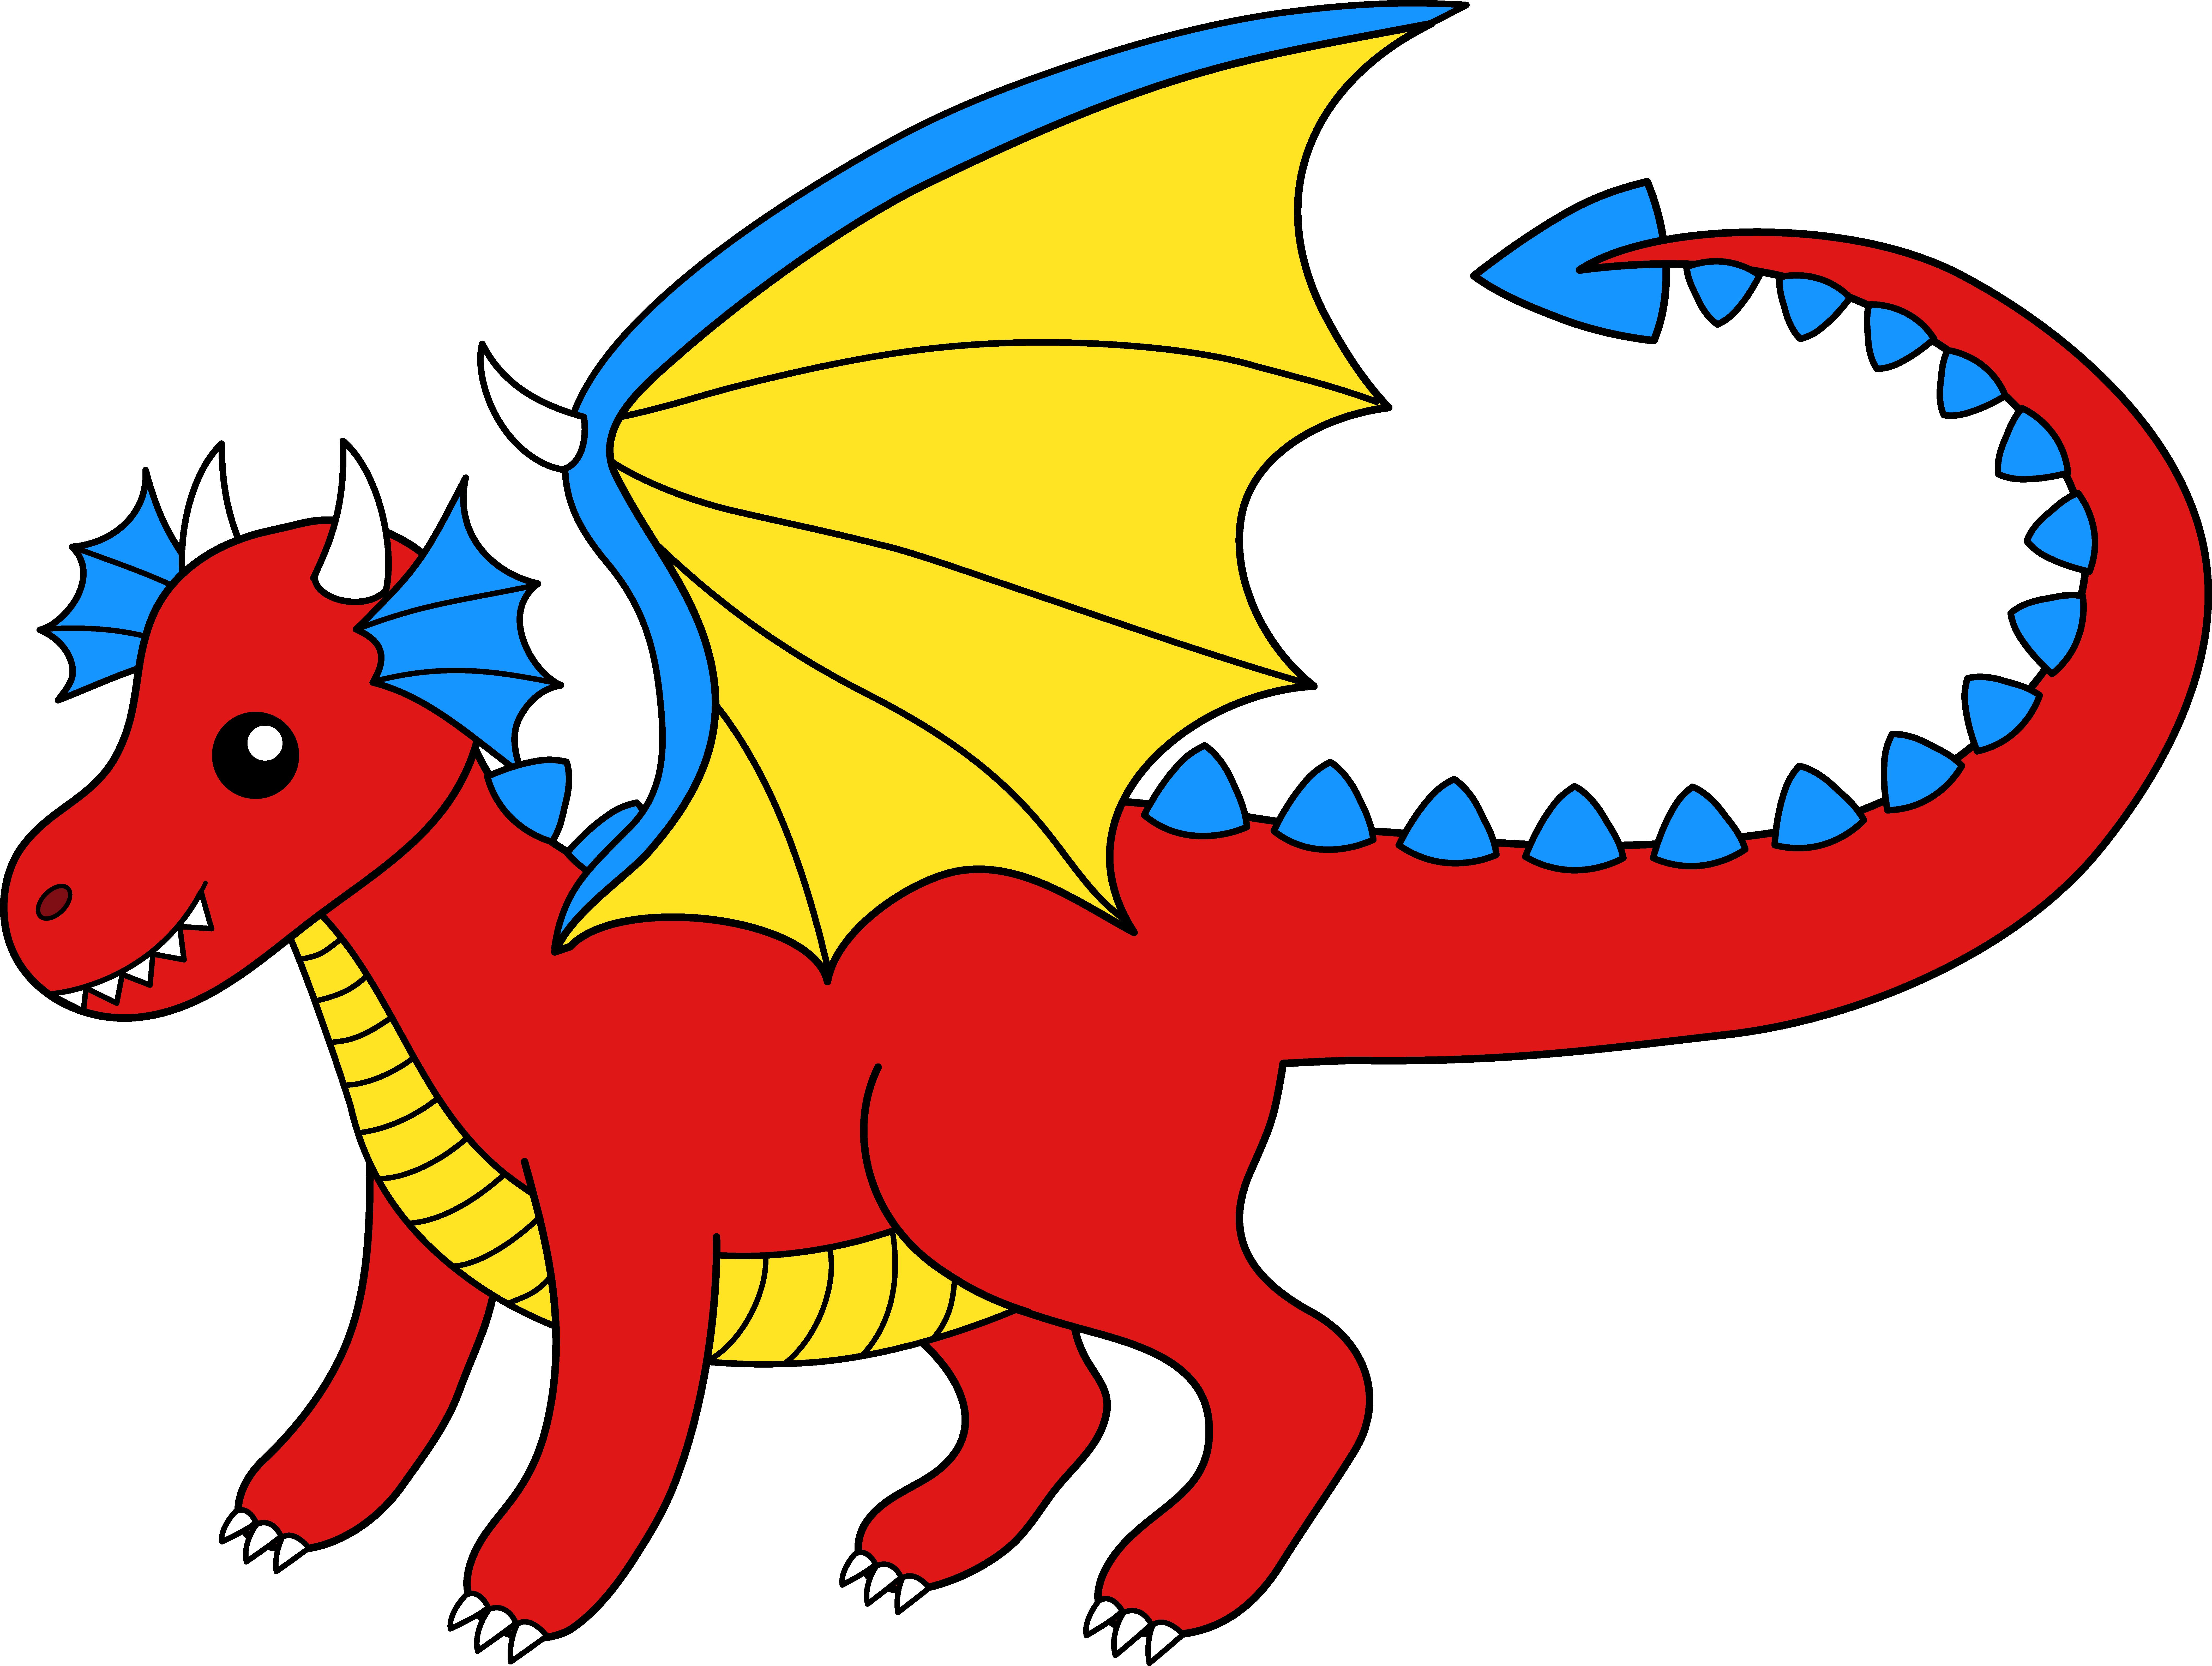 Dragon clip art images. Magician clipart folklore